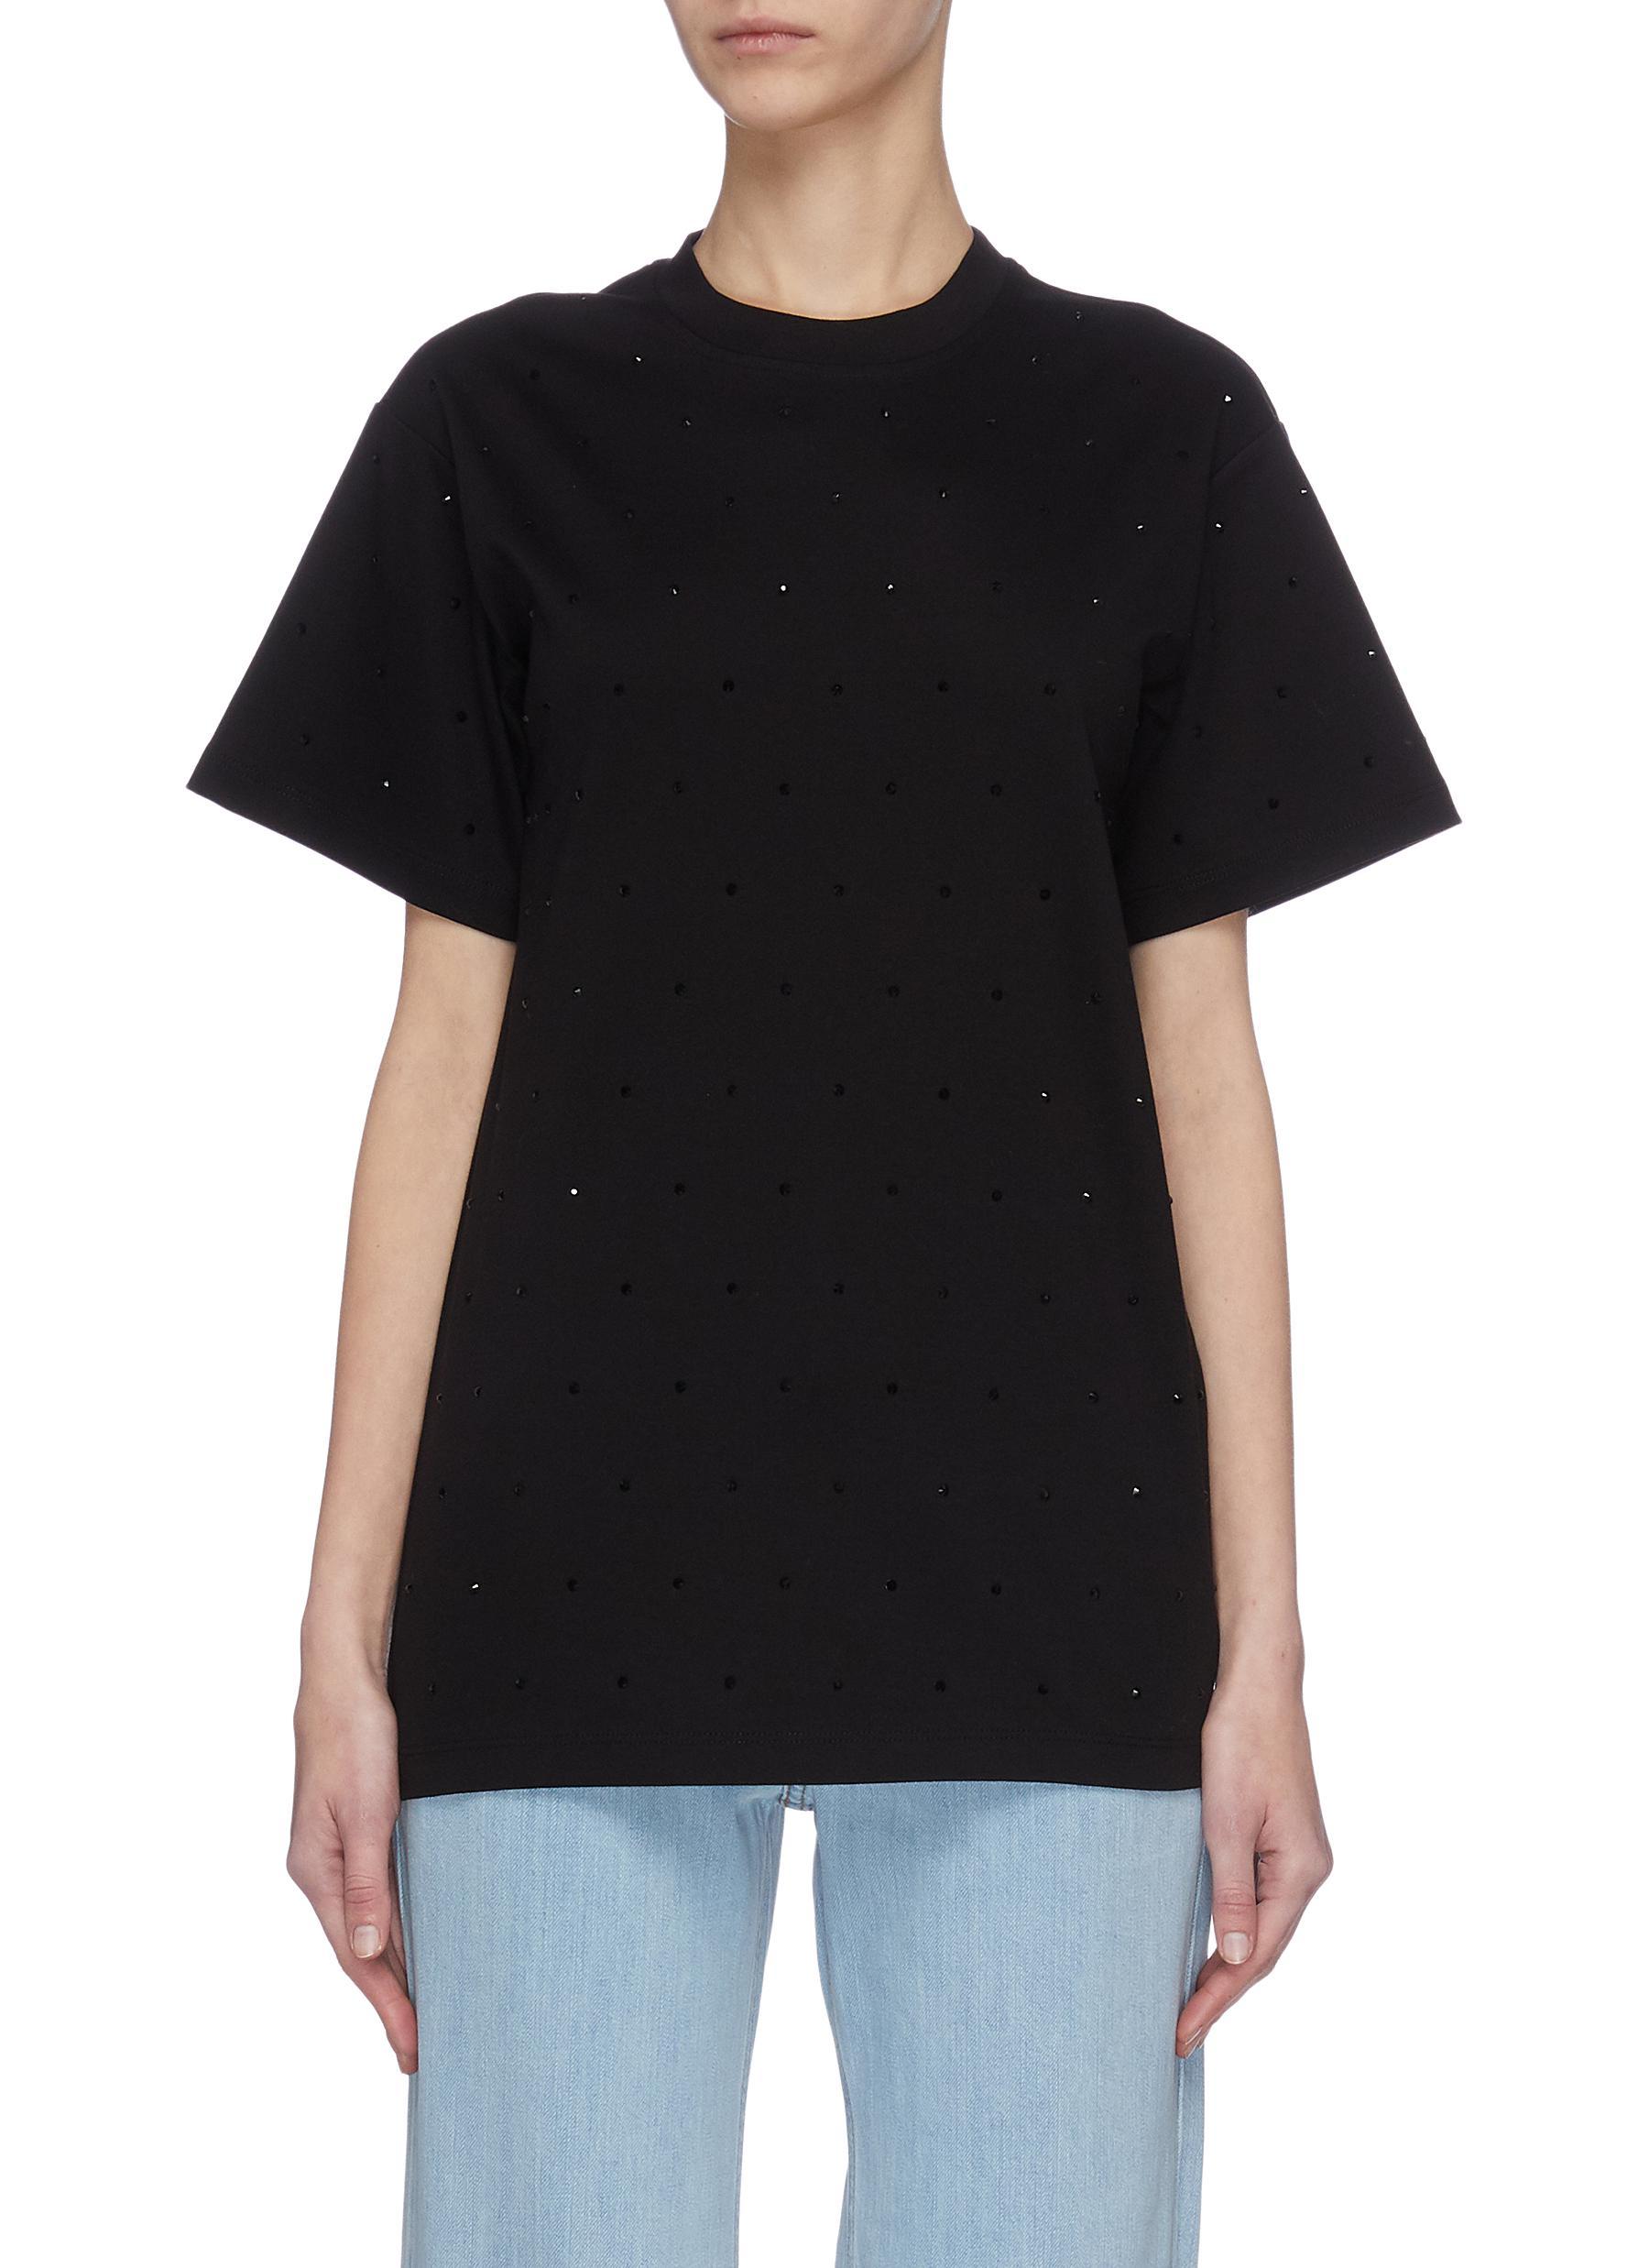 Buy Victoria, Victoria Beckham Tops Embellished T-shirt